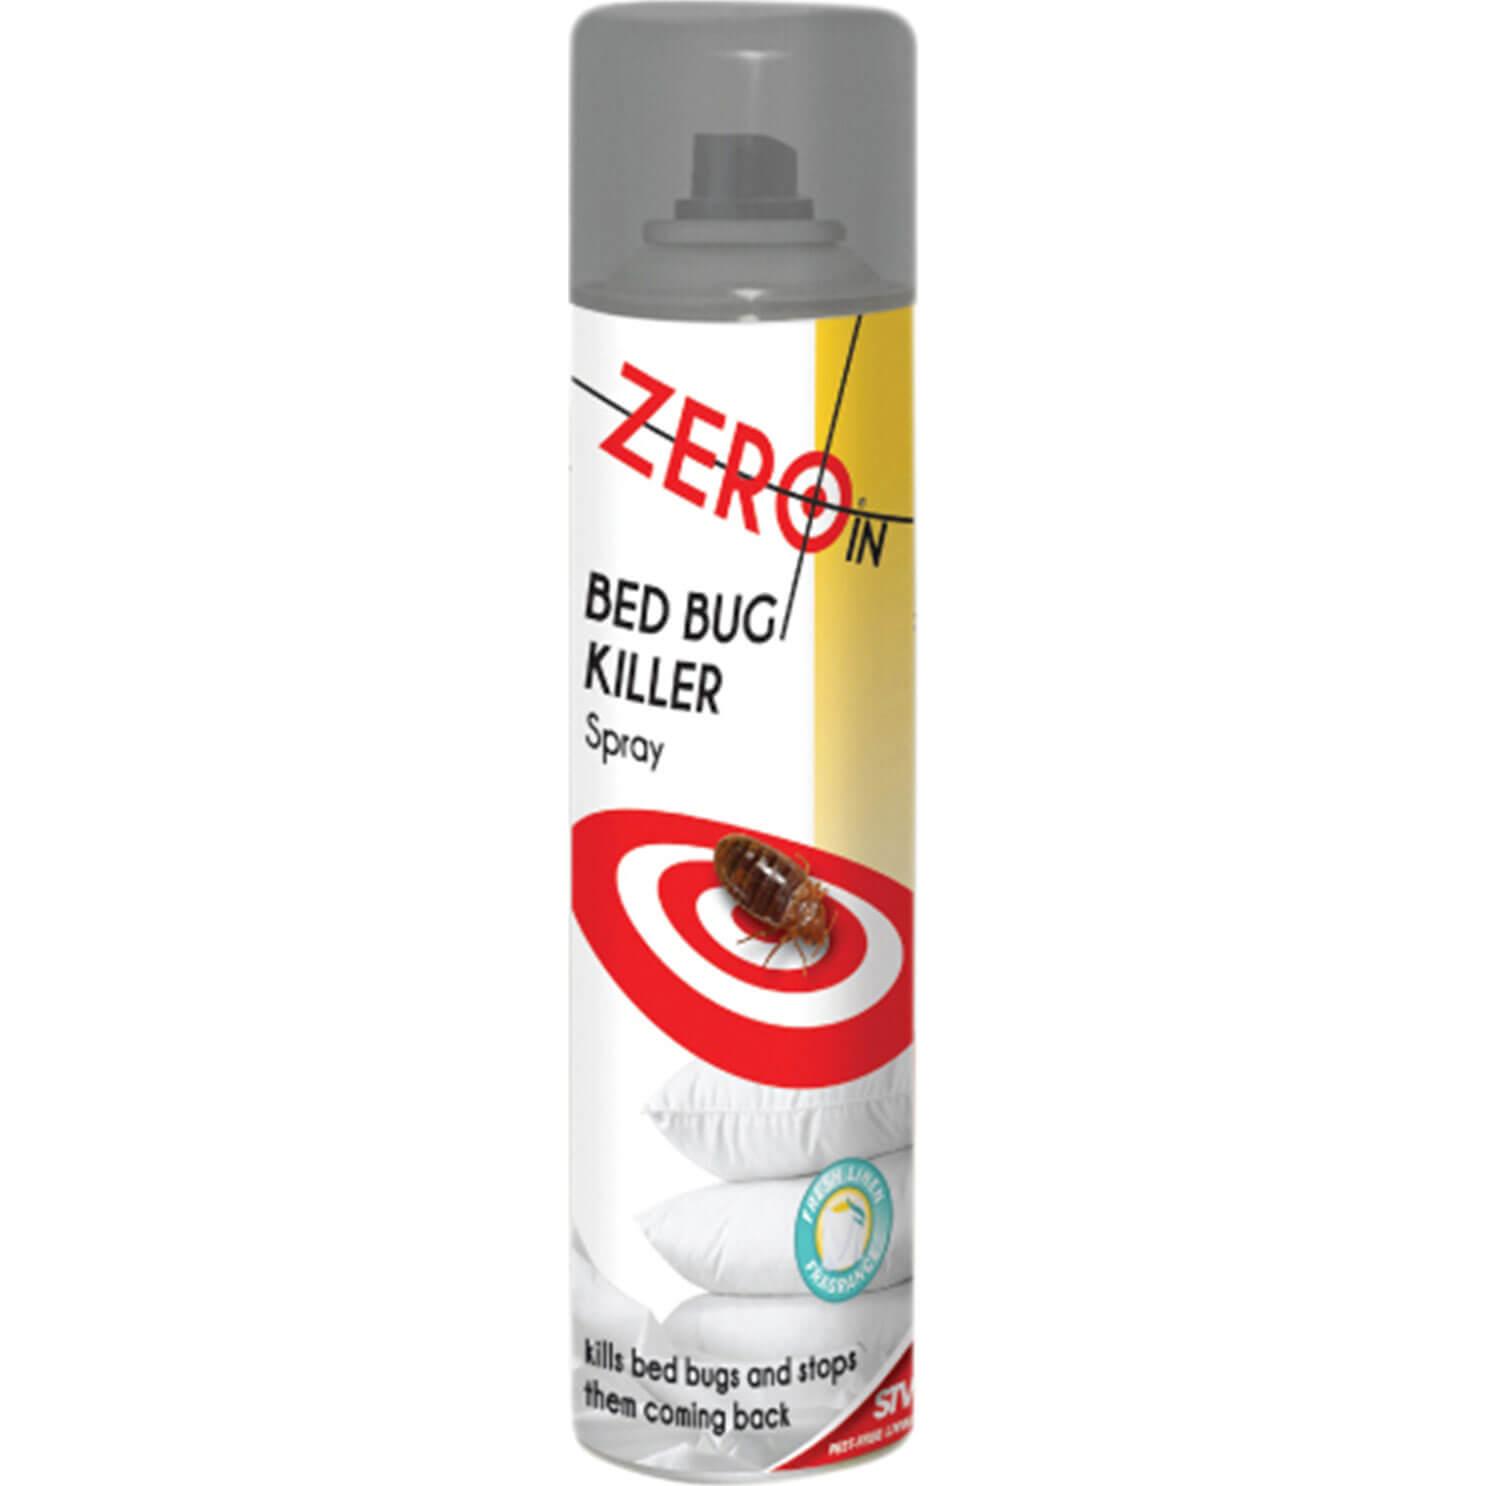 Image of STV Big Cheese Zero In Bed Bug Killer 300ml